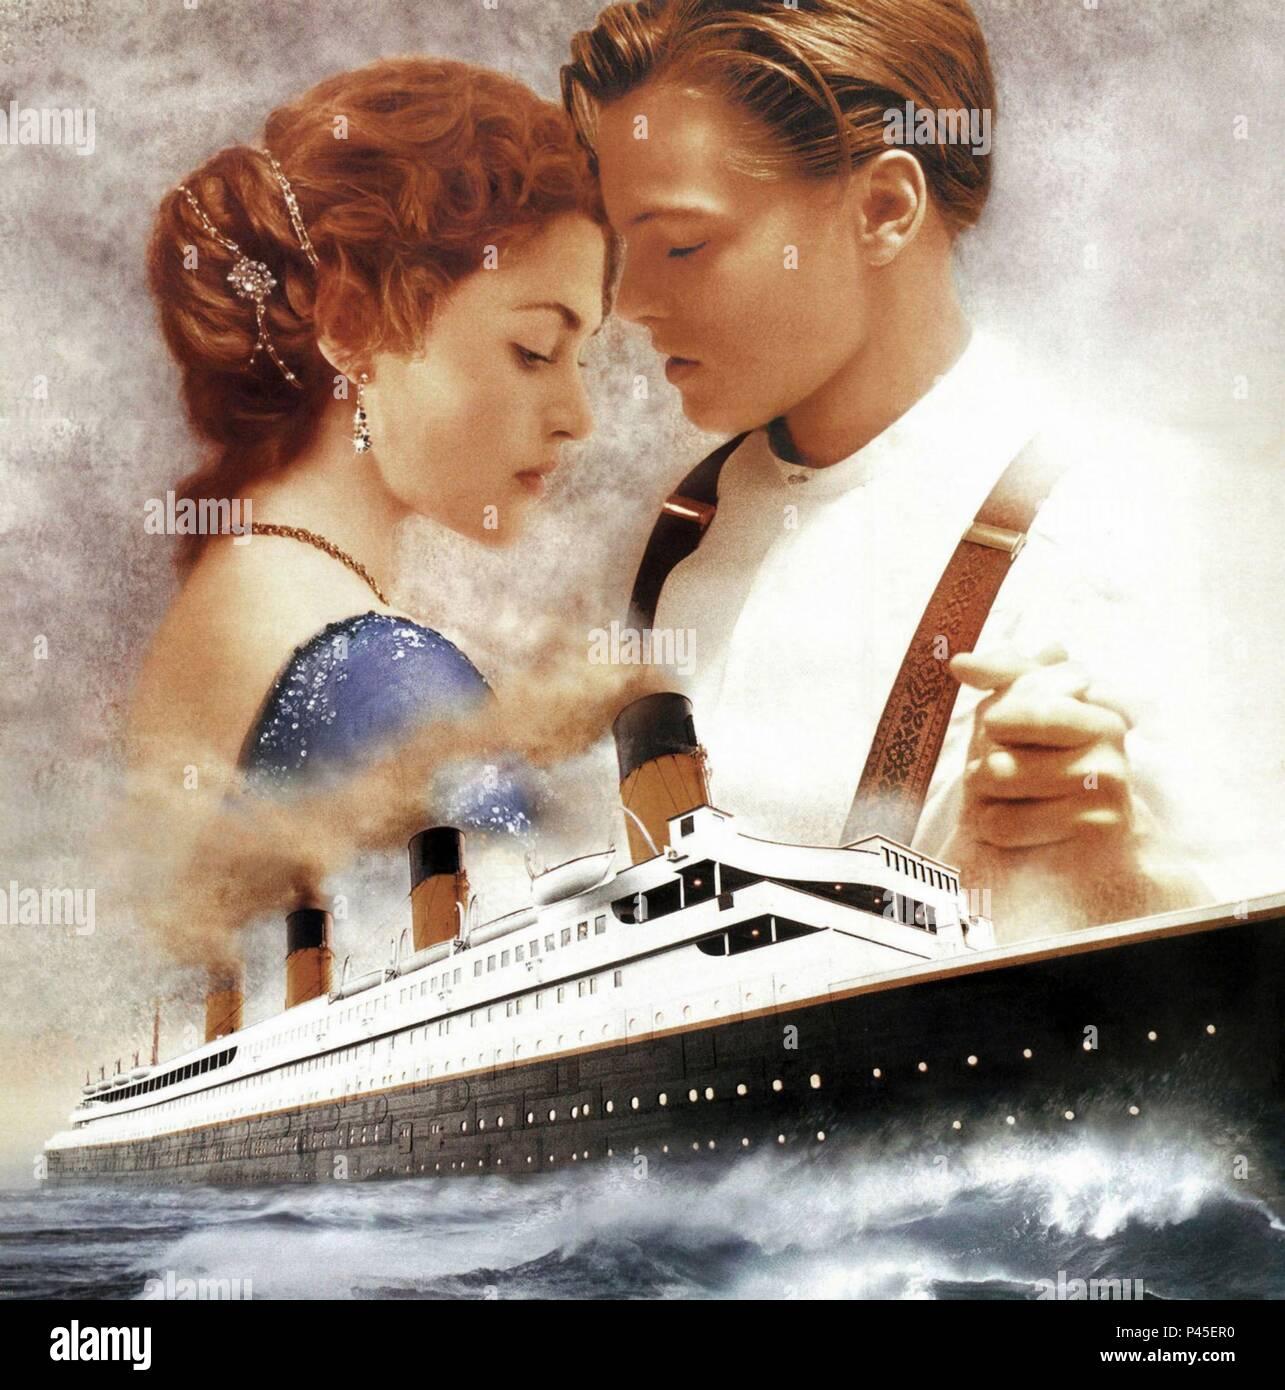 Titanic Movie: Titanic Poster Film Stock Photos & Titanic Poster Film